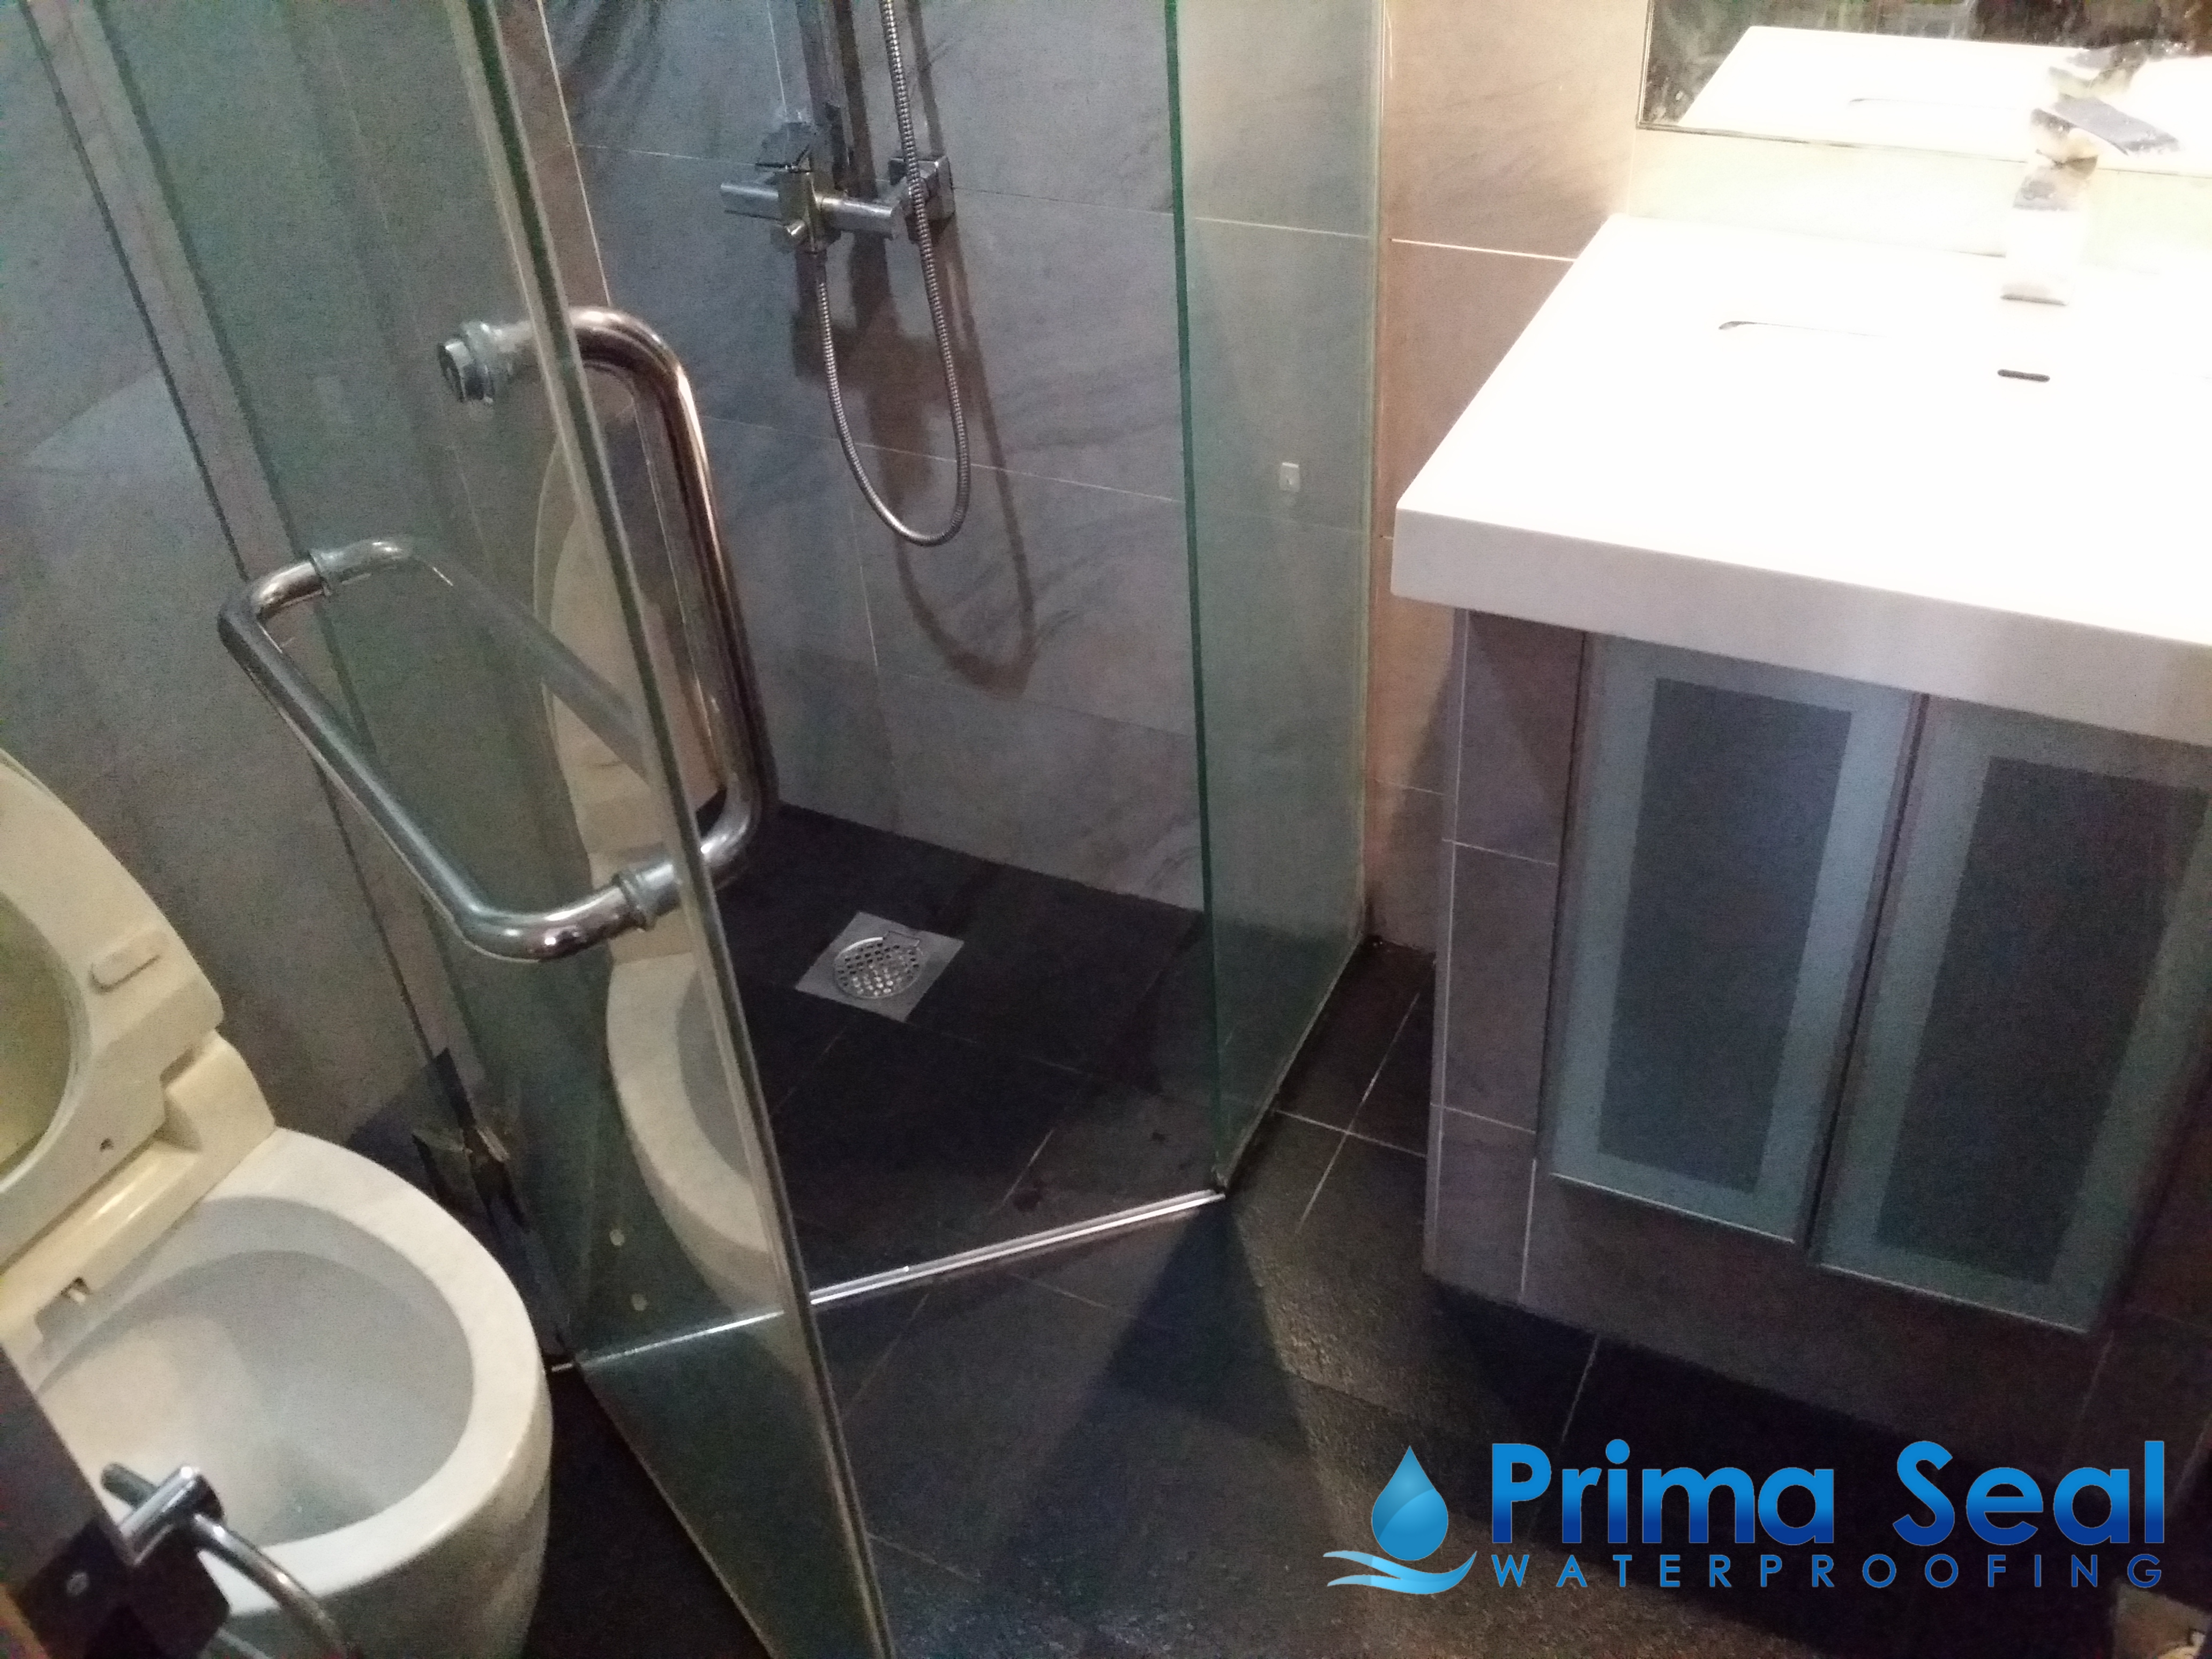 Master Bathroom Waterproofing Condo The Mayfair Jurong East Street 32 Prima Seal